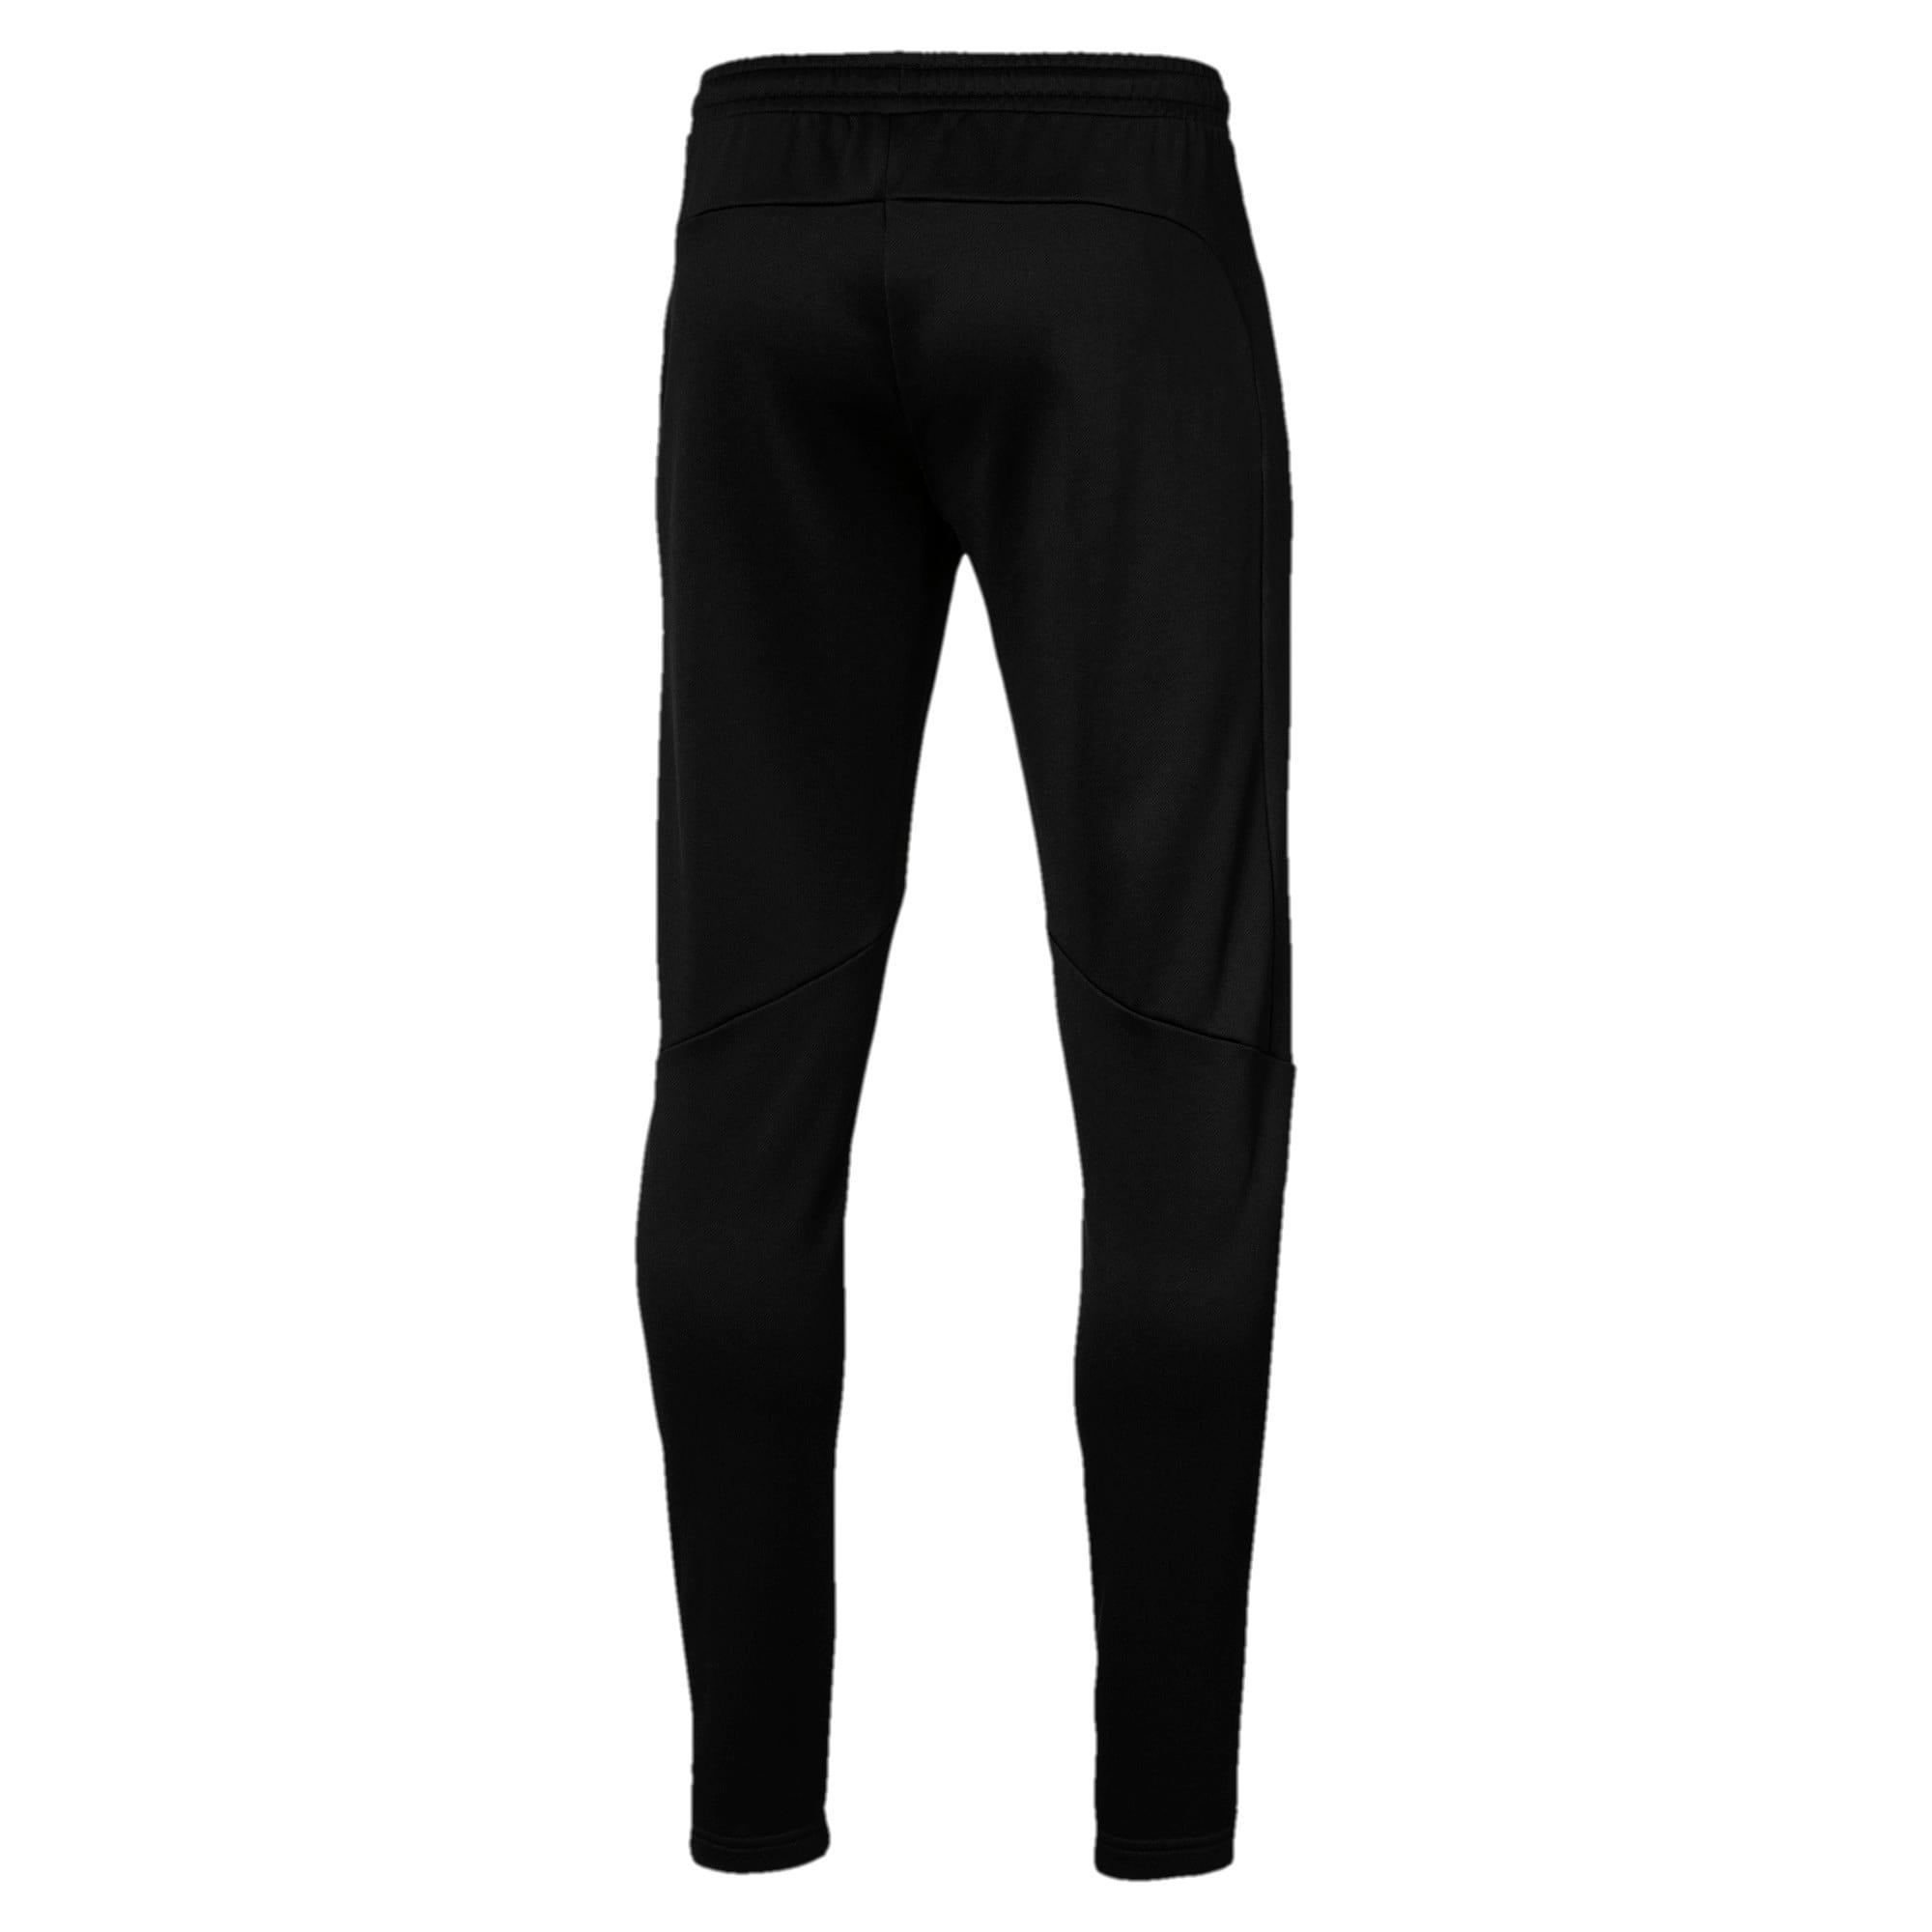 Thumbnail 5 of MERCEDES AMG PETRONAS Men's T7 Track Pants, Puma Black, medium-IND